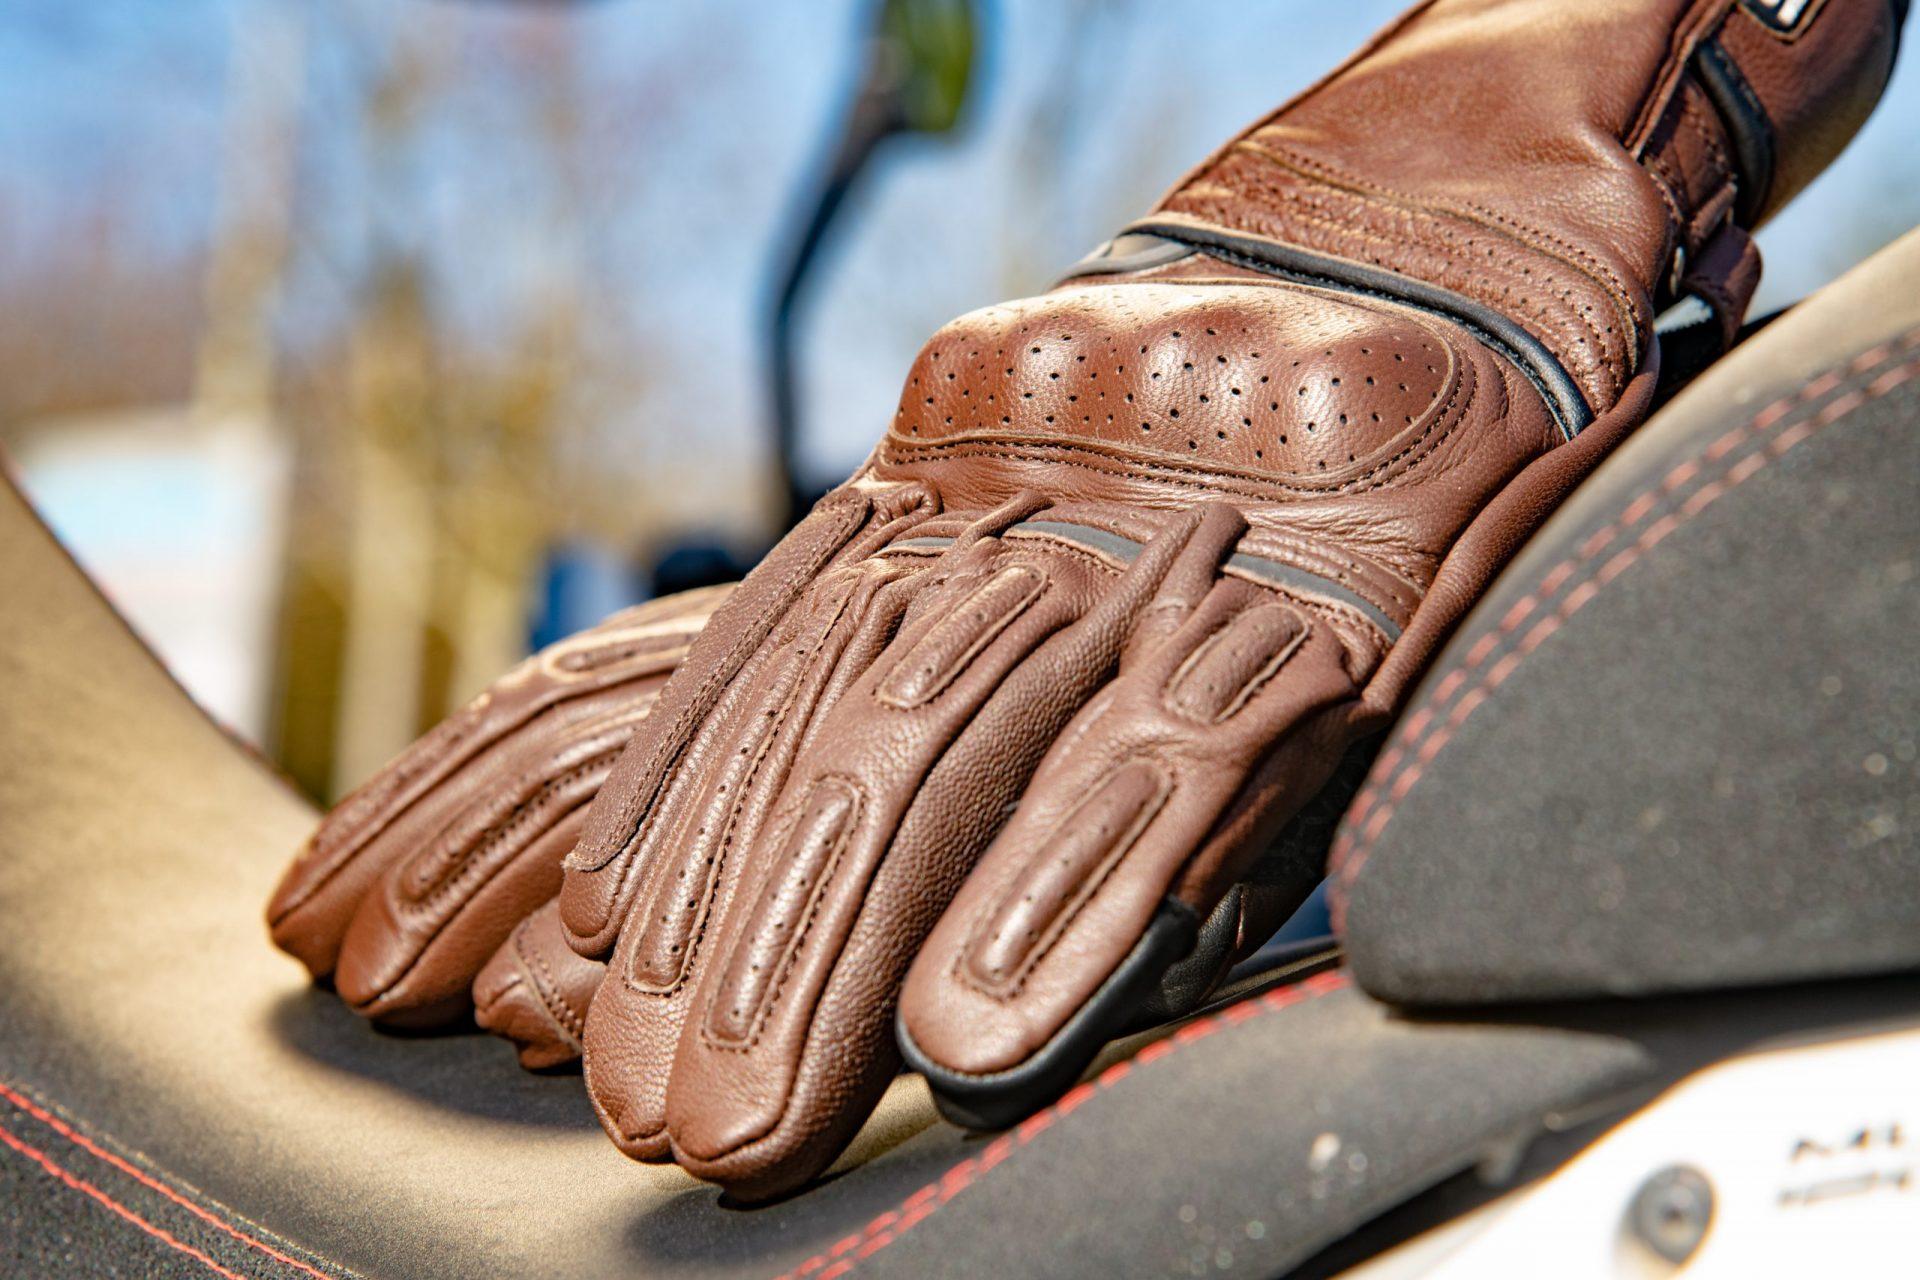 GM197202-Hamilton-MS-Glove-Brown-4-scaled Hamilton Dry2Dry™ Winter Gloves